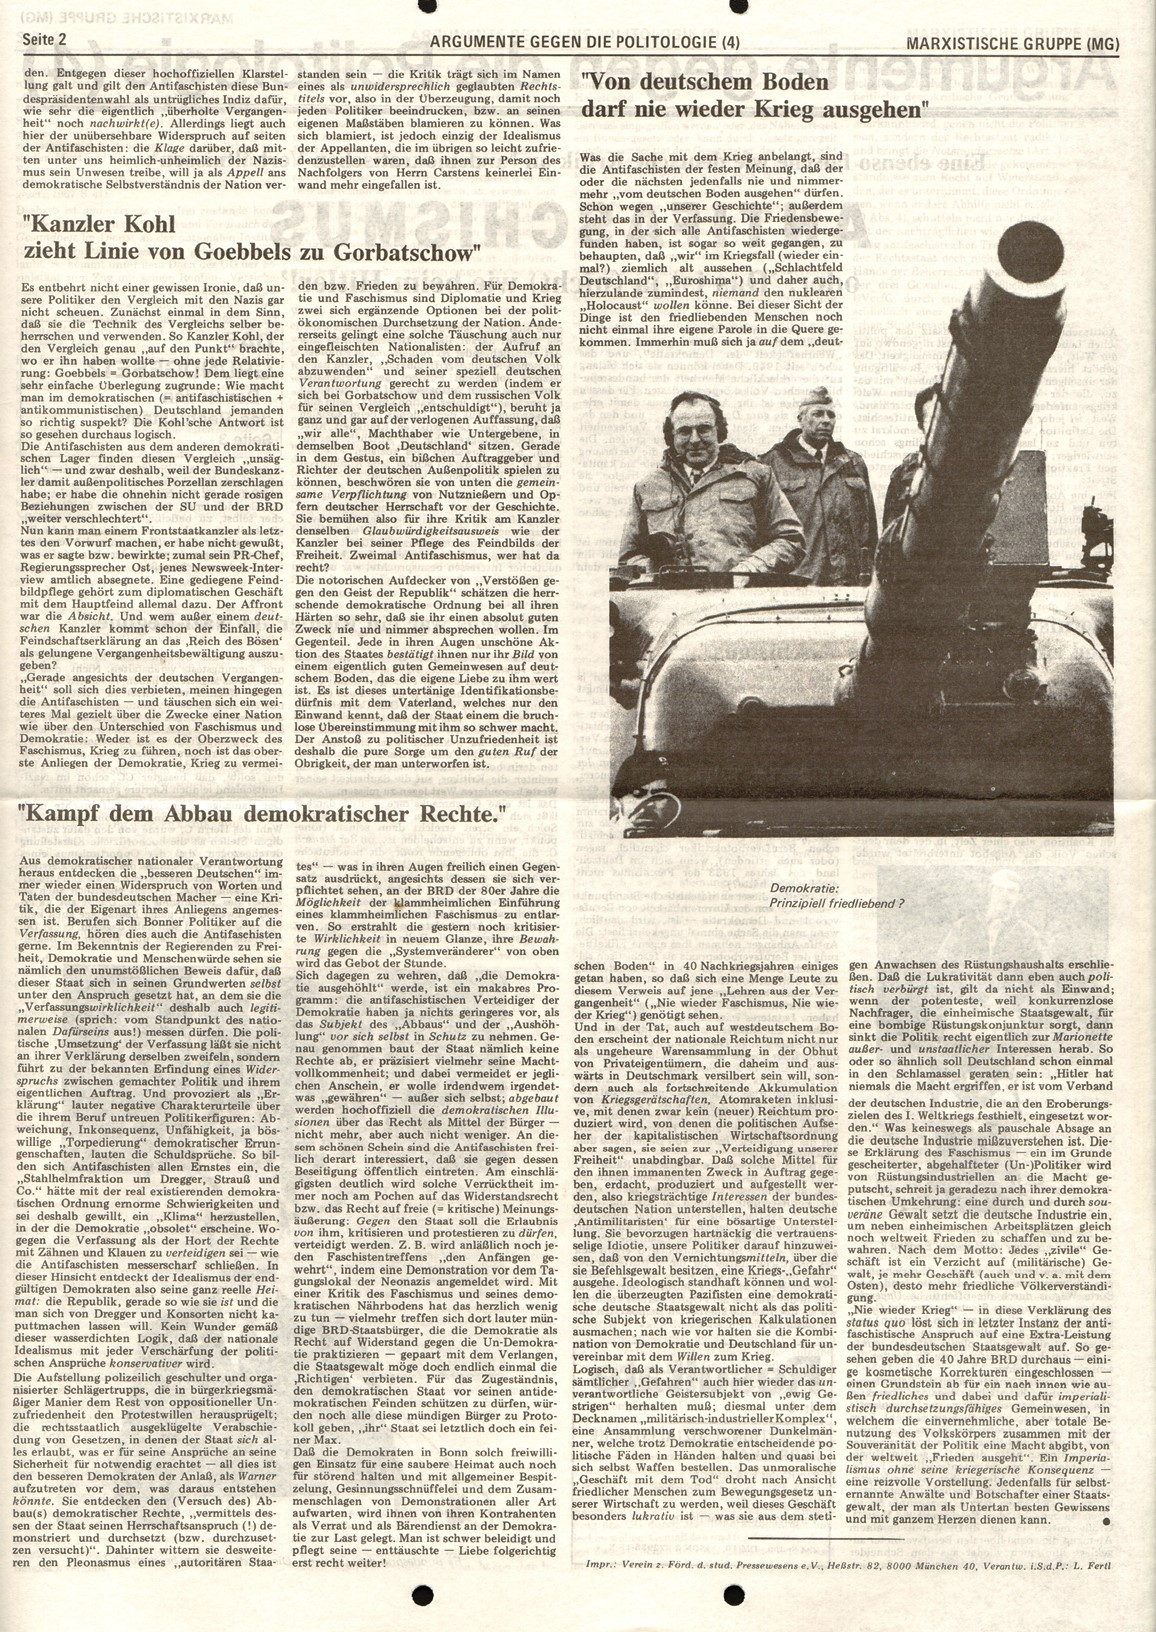 MG_Argumente_19870400_Pol_Antifaschismus_02